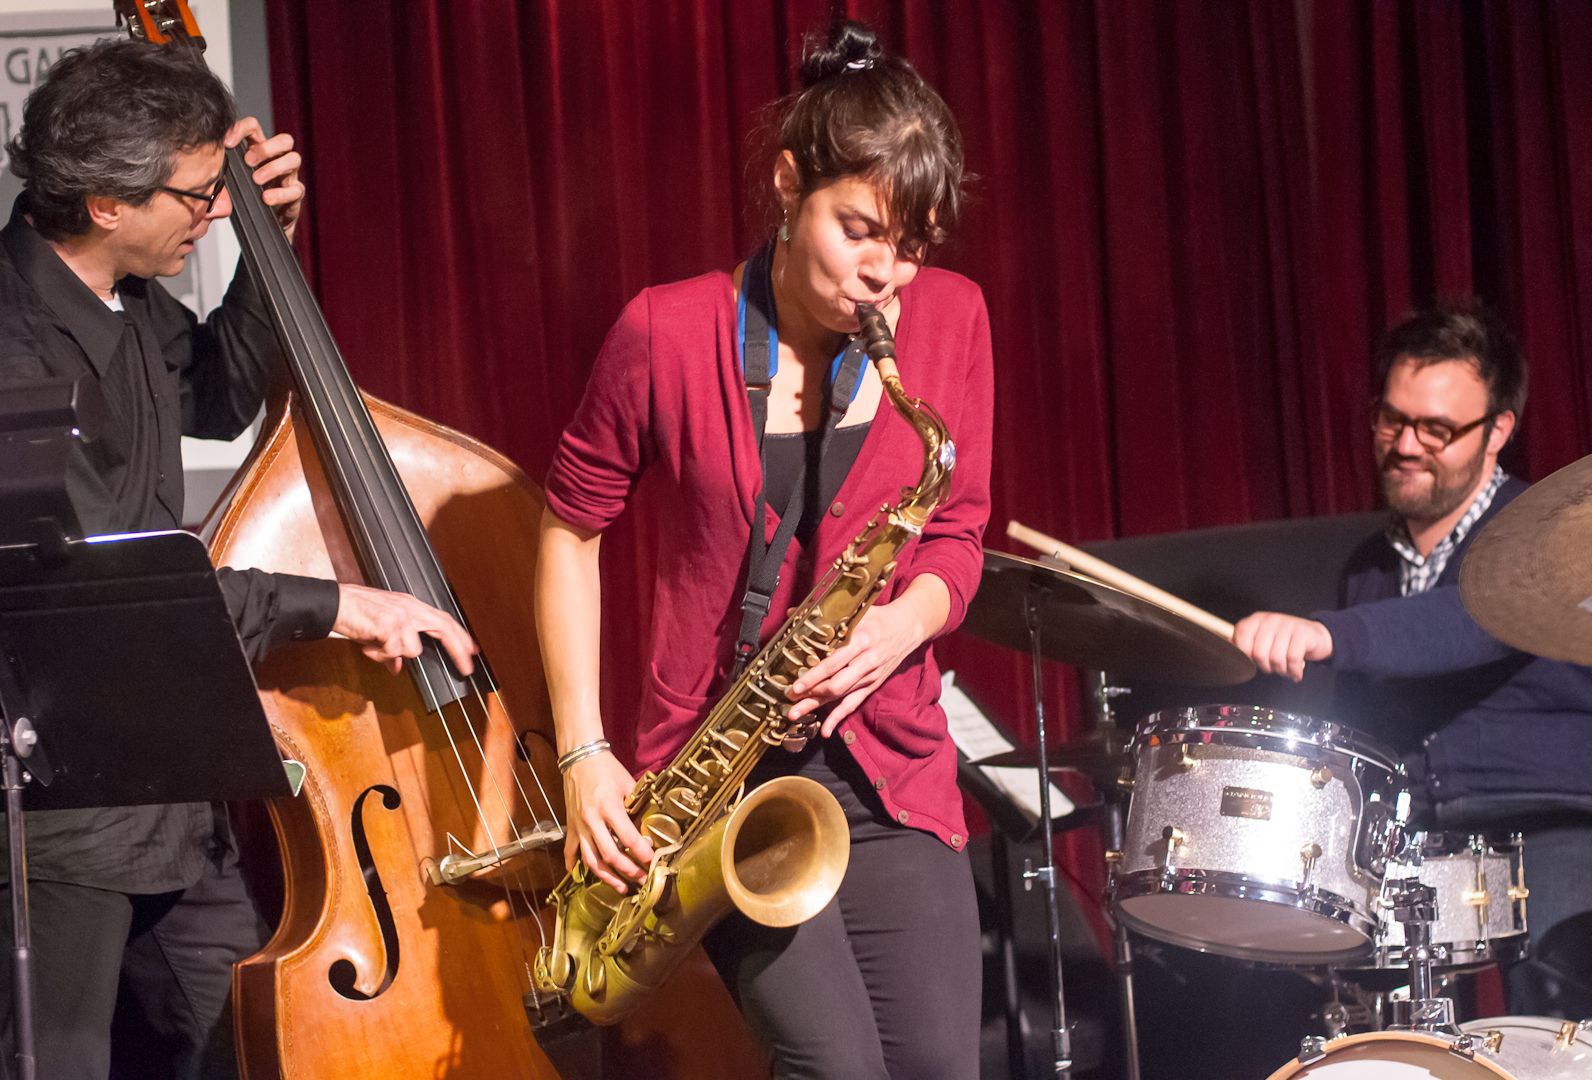 Joseph Lepore, Melissa Aladana and Colin Stranahan with Quartet at the Jazz Gallery